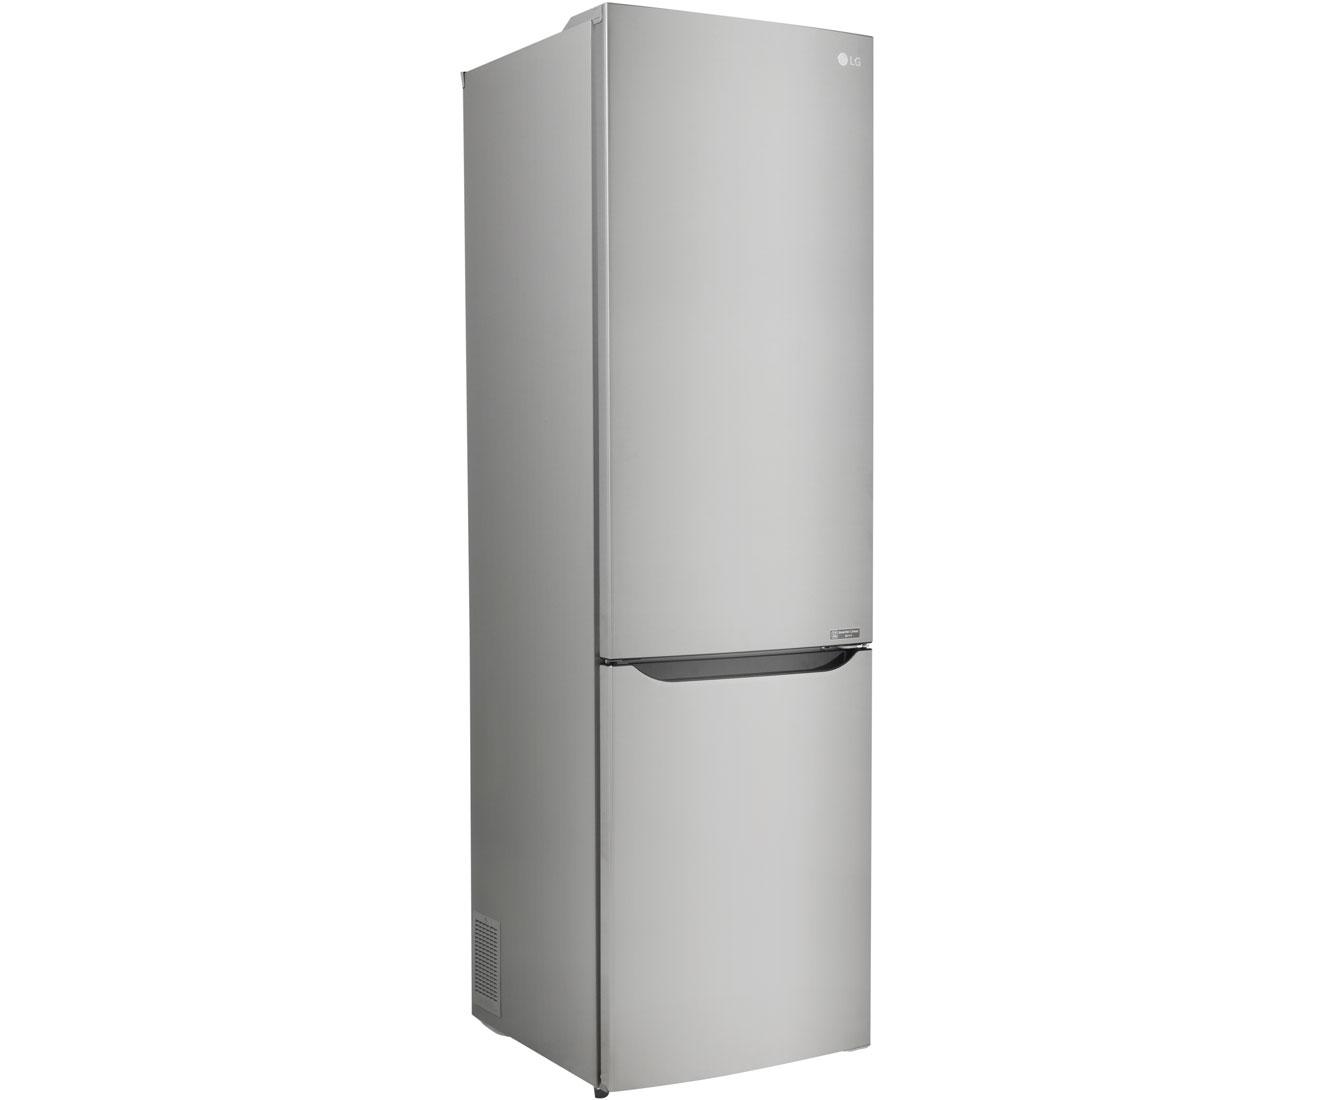 Side By Side Kühlschrank Lg : Lg kühlschrank 10 modelle 1 sieger tÜv geprüfter side by side